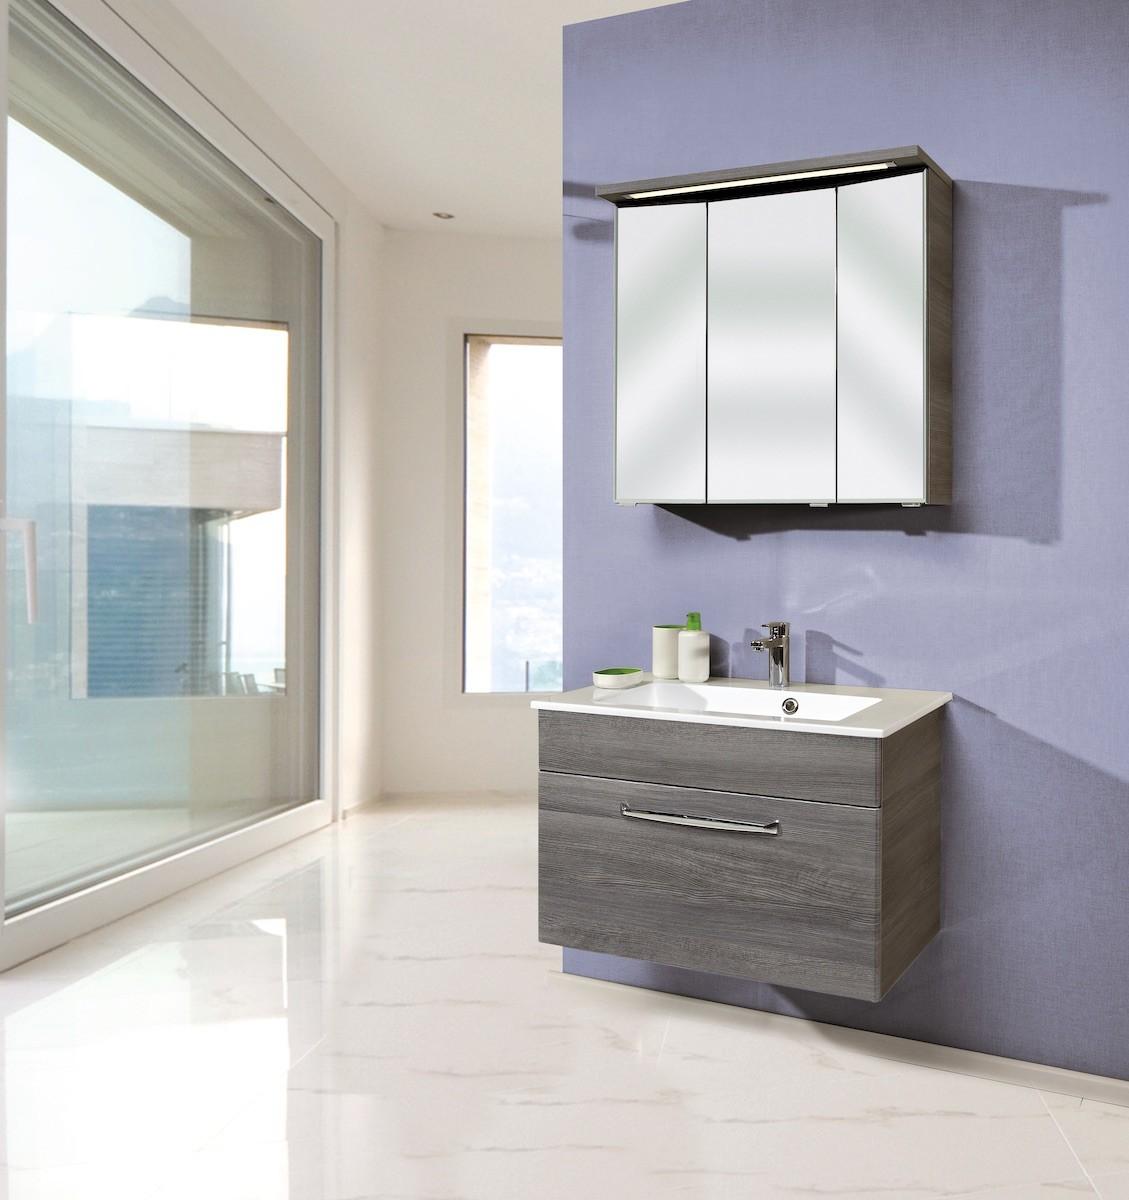 bad-waschtisch-spiegelschrank-boer-coesfeld